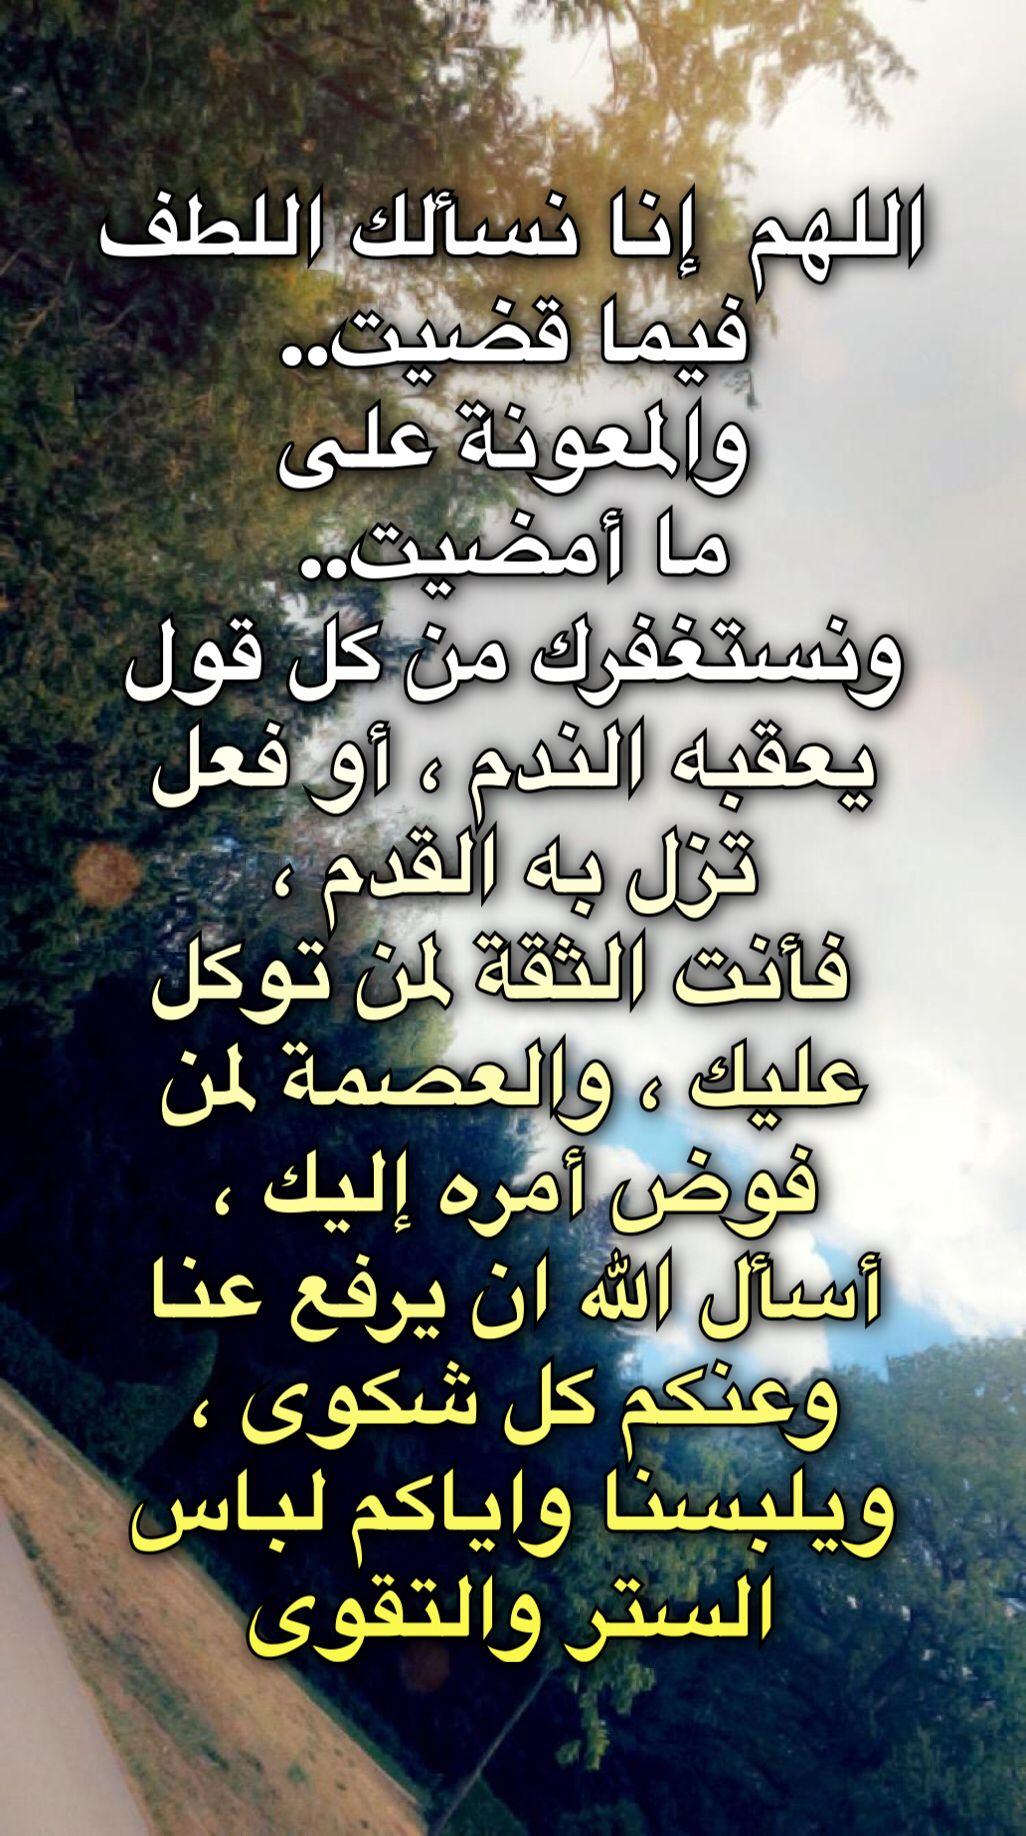 آمين يا رب Arabic Calligraphy Calligraphy Islam